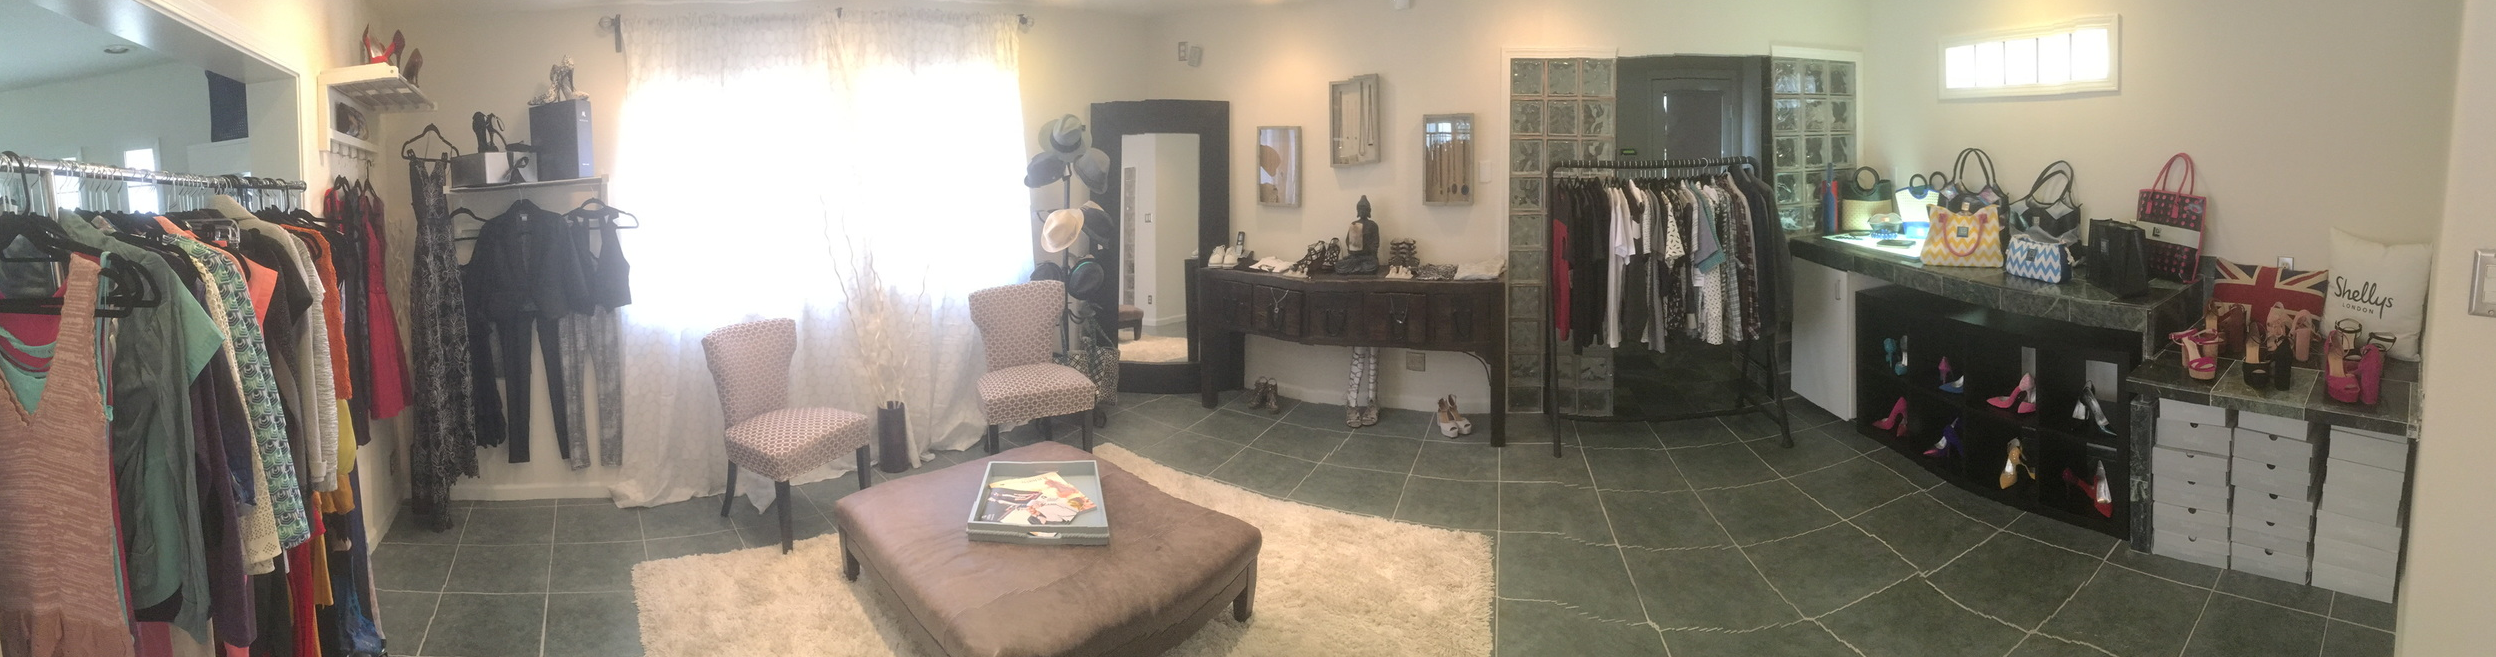 fem pr showroom